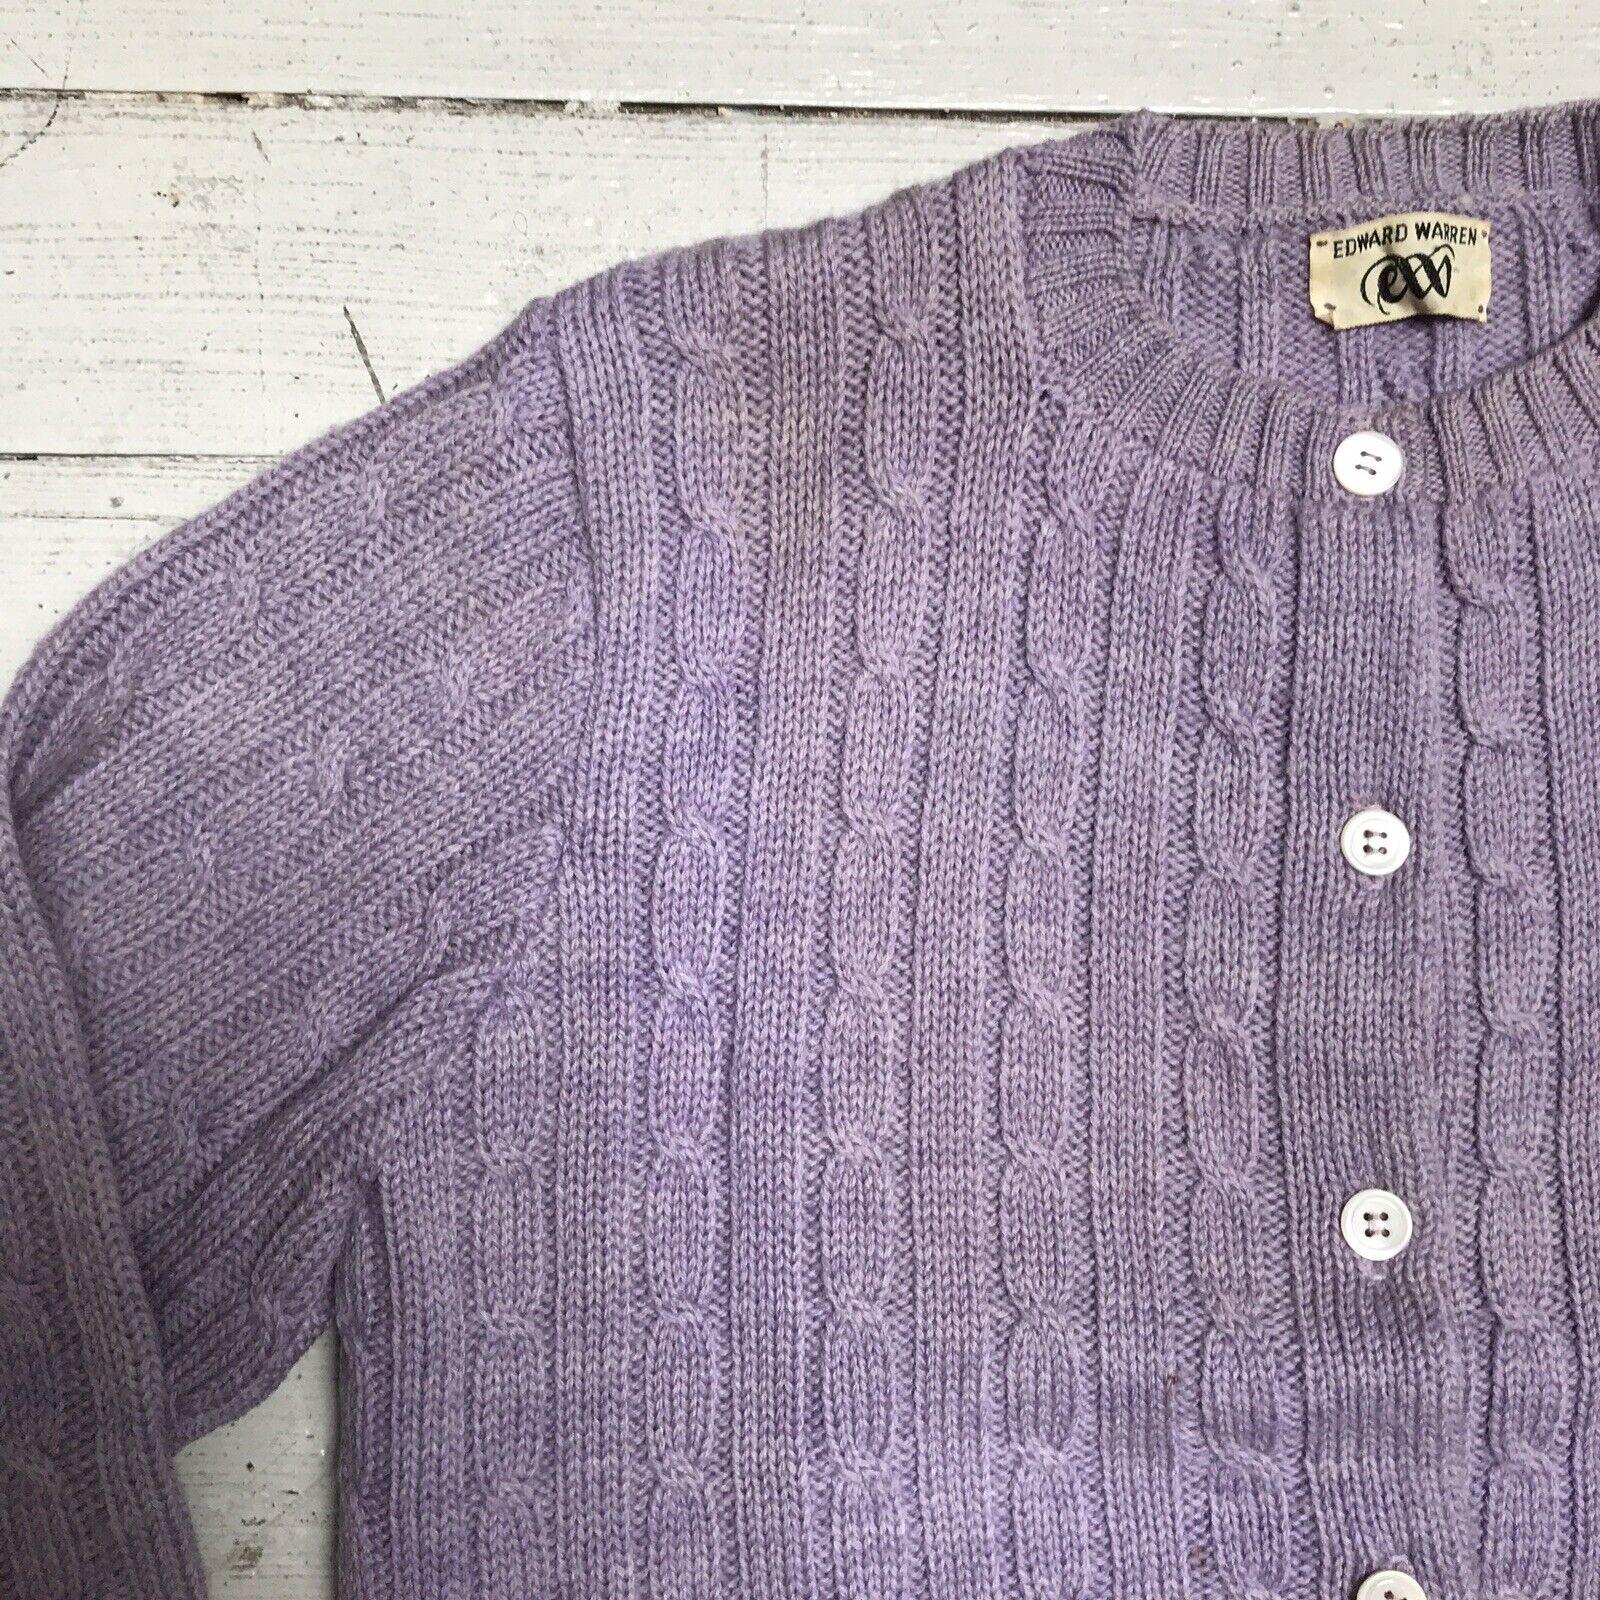 VTG EDWARD WARREN Light Purple Lilac Cable Knit S… - image 4